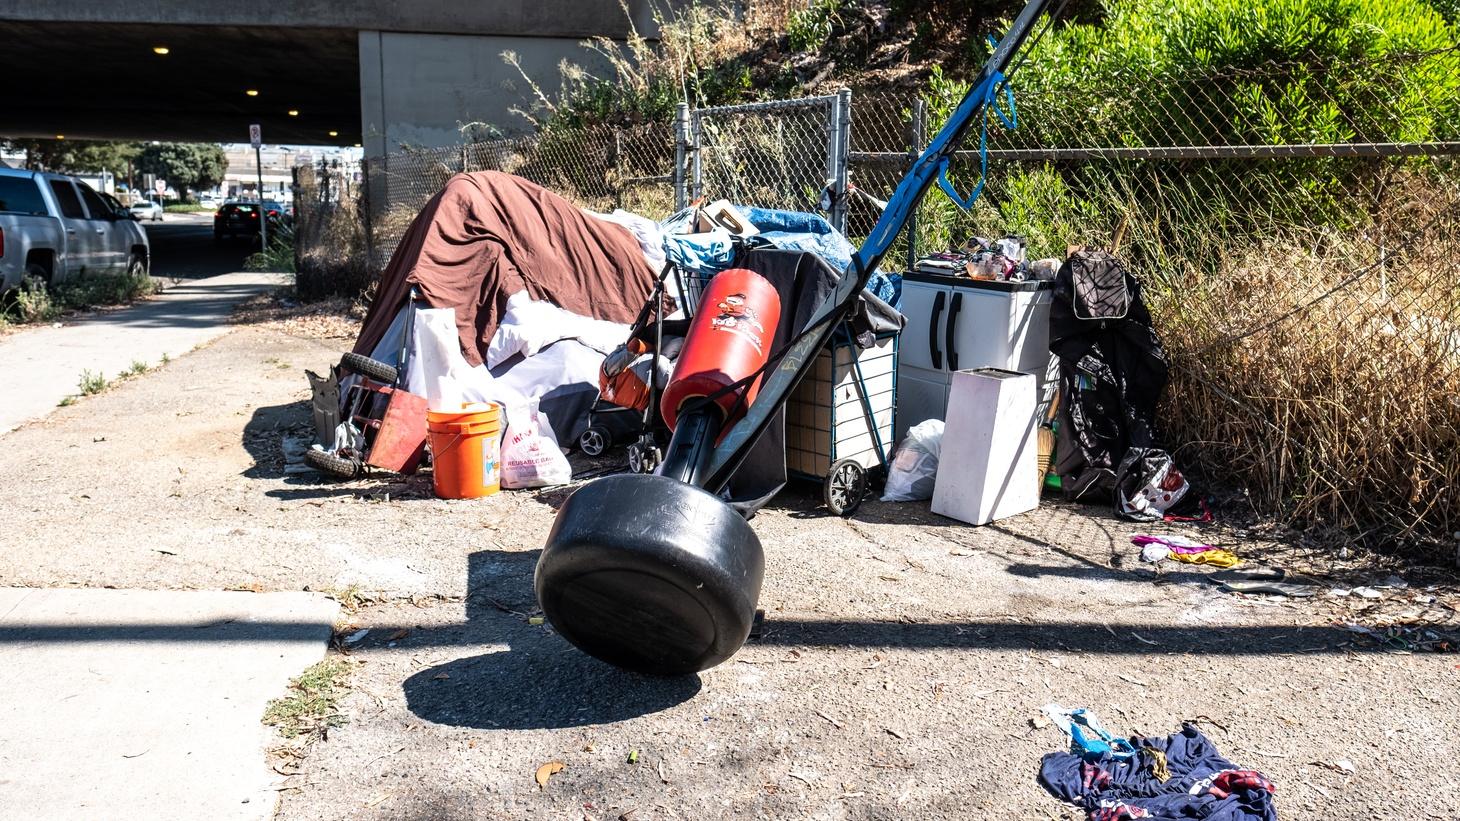 A homeless encampment in Santa Monica, August 2019.